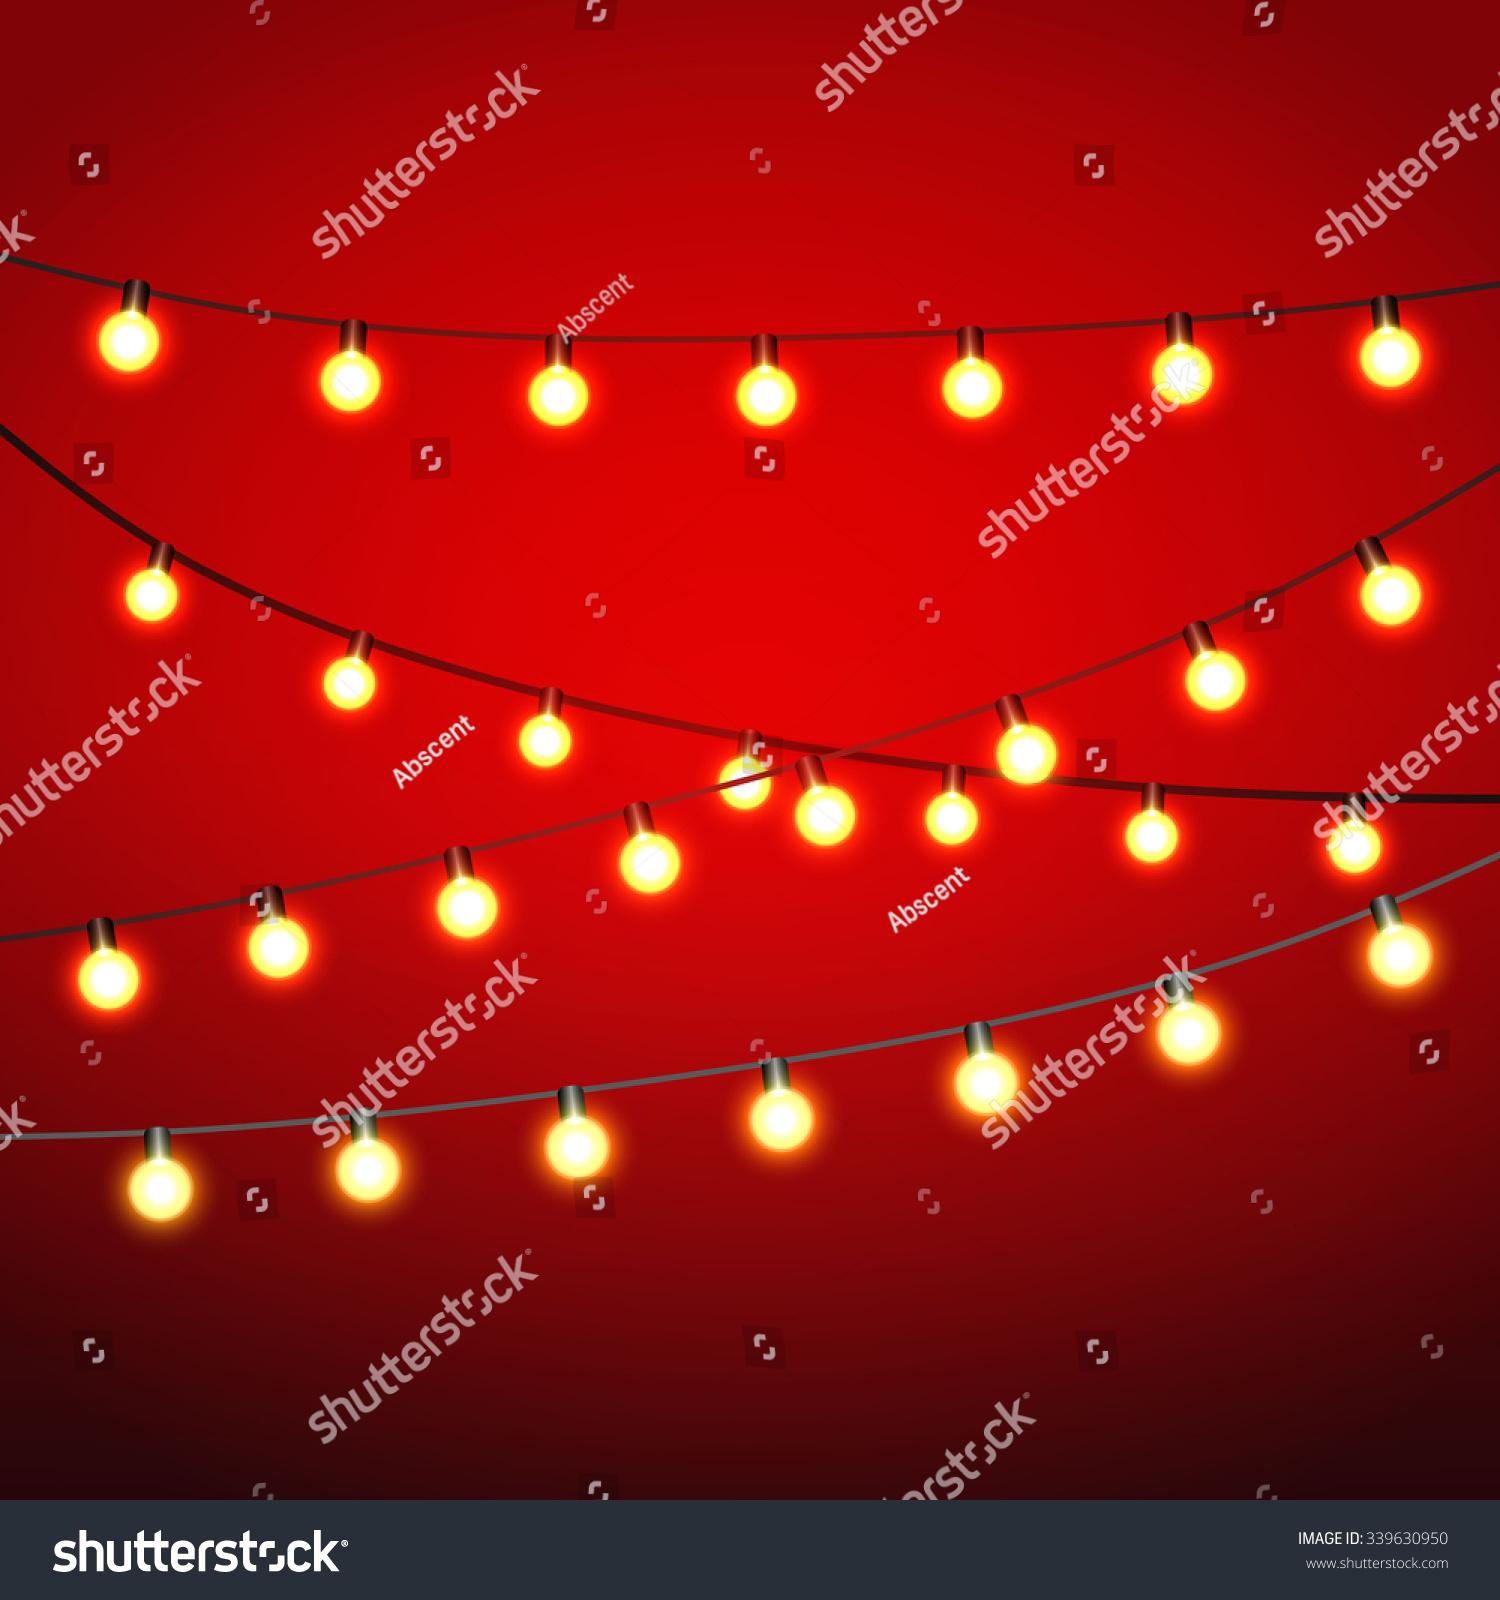 Warm Yellow Lights Bulb Black Strings Stock Illustration 339630950 - Shutterstock